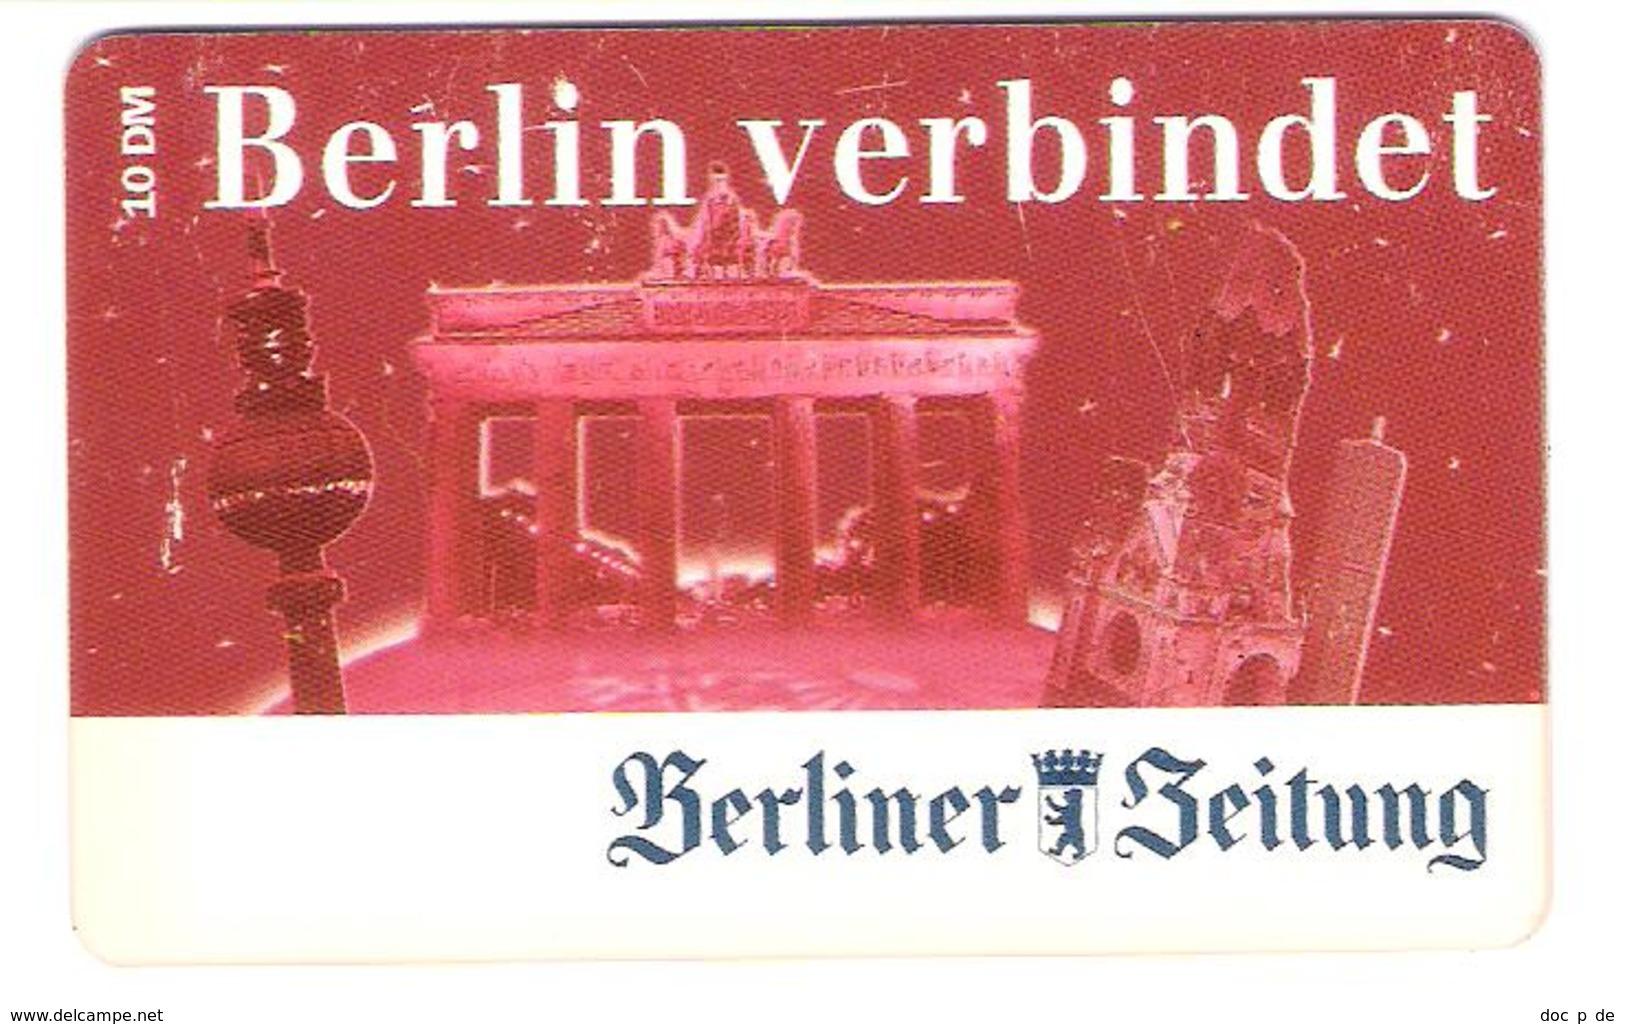 Germany - Prepaid - ABCom - Berliner Zeitung - Newspaper - Berlin - Fernsehturm - Brandenburger Tor - Ex. Date 05/2001 - Germany